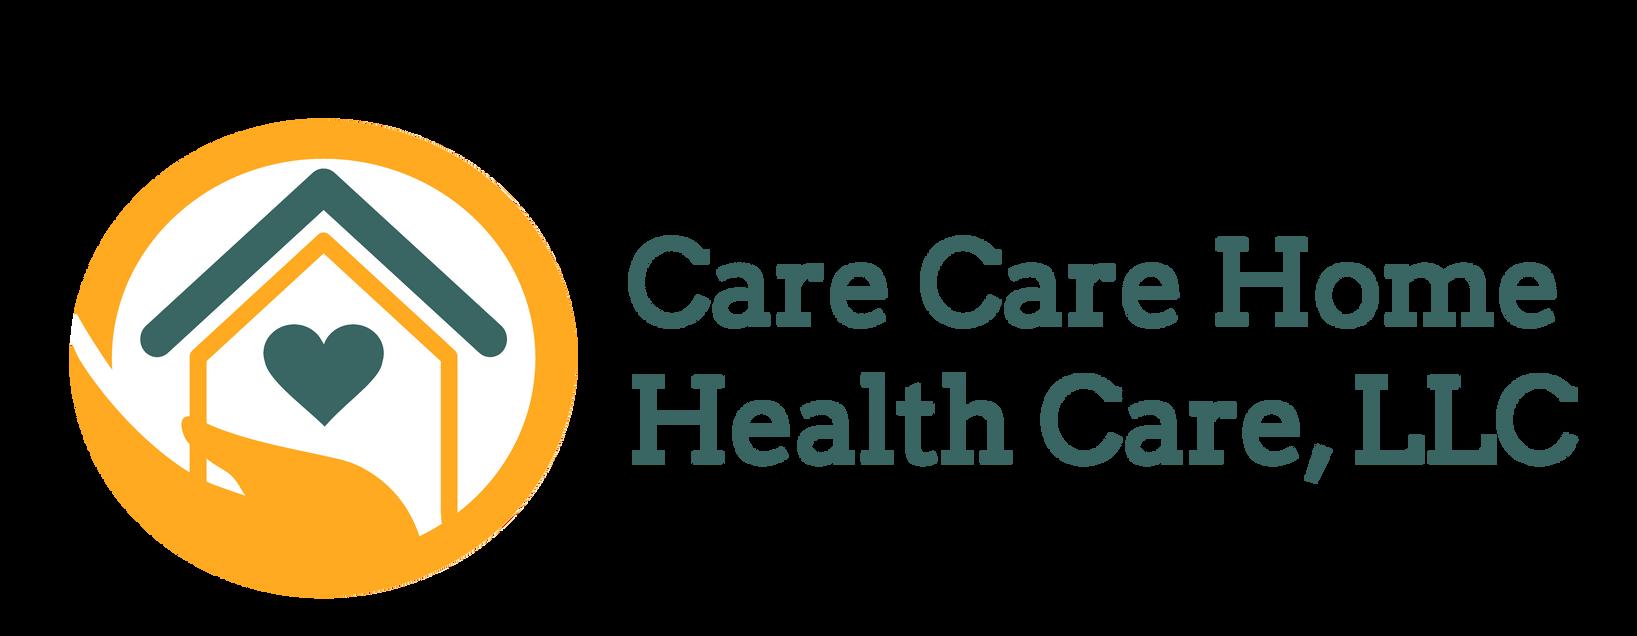 CC Logo11-10.png